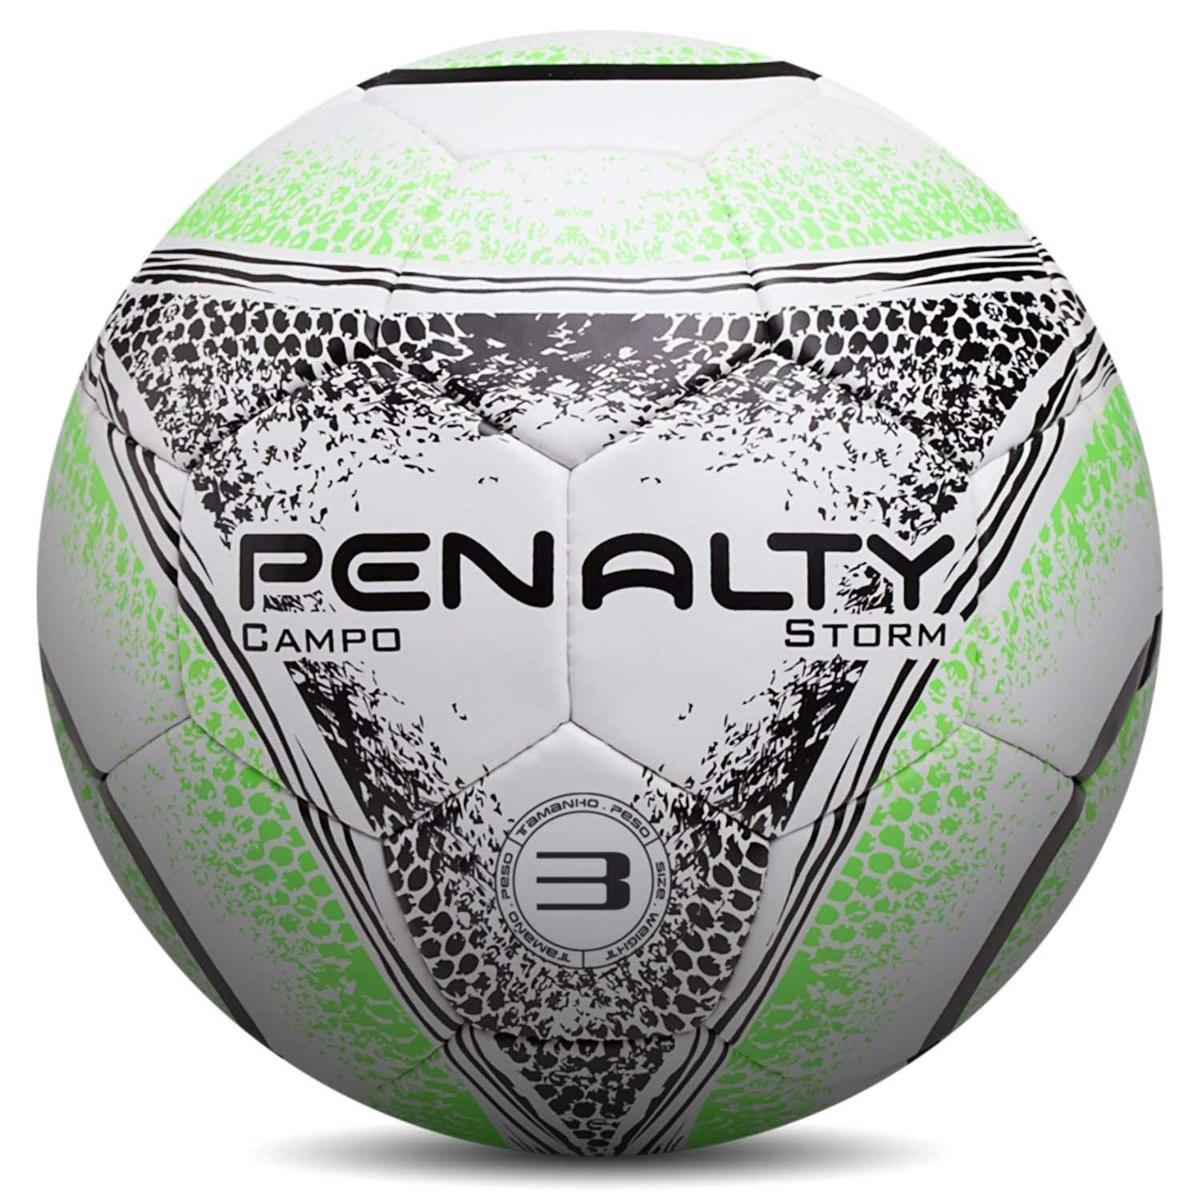 bola campo penalty storm n3 costurada. Carregando zoom. b8c5397acf881